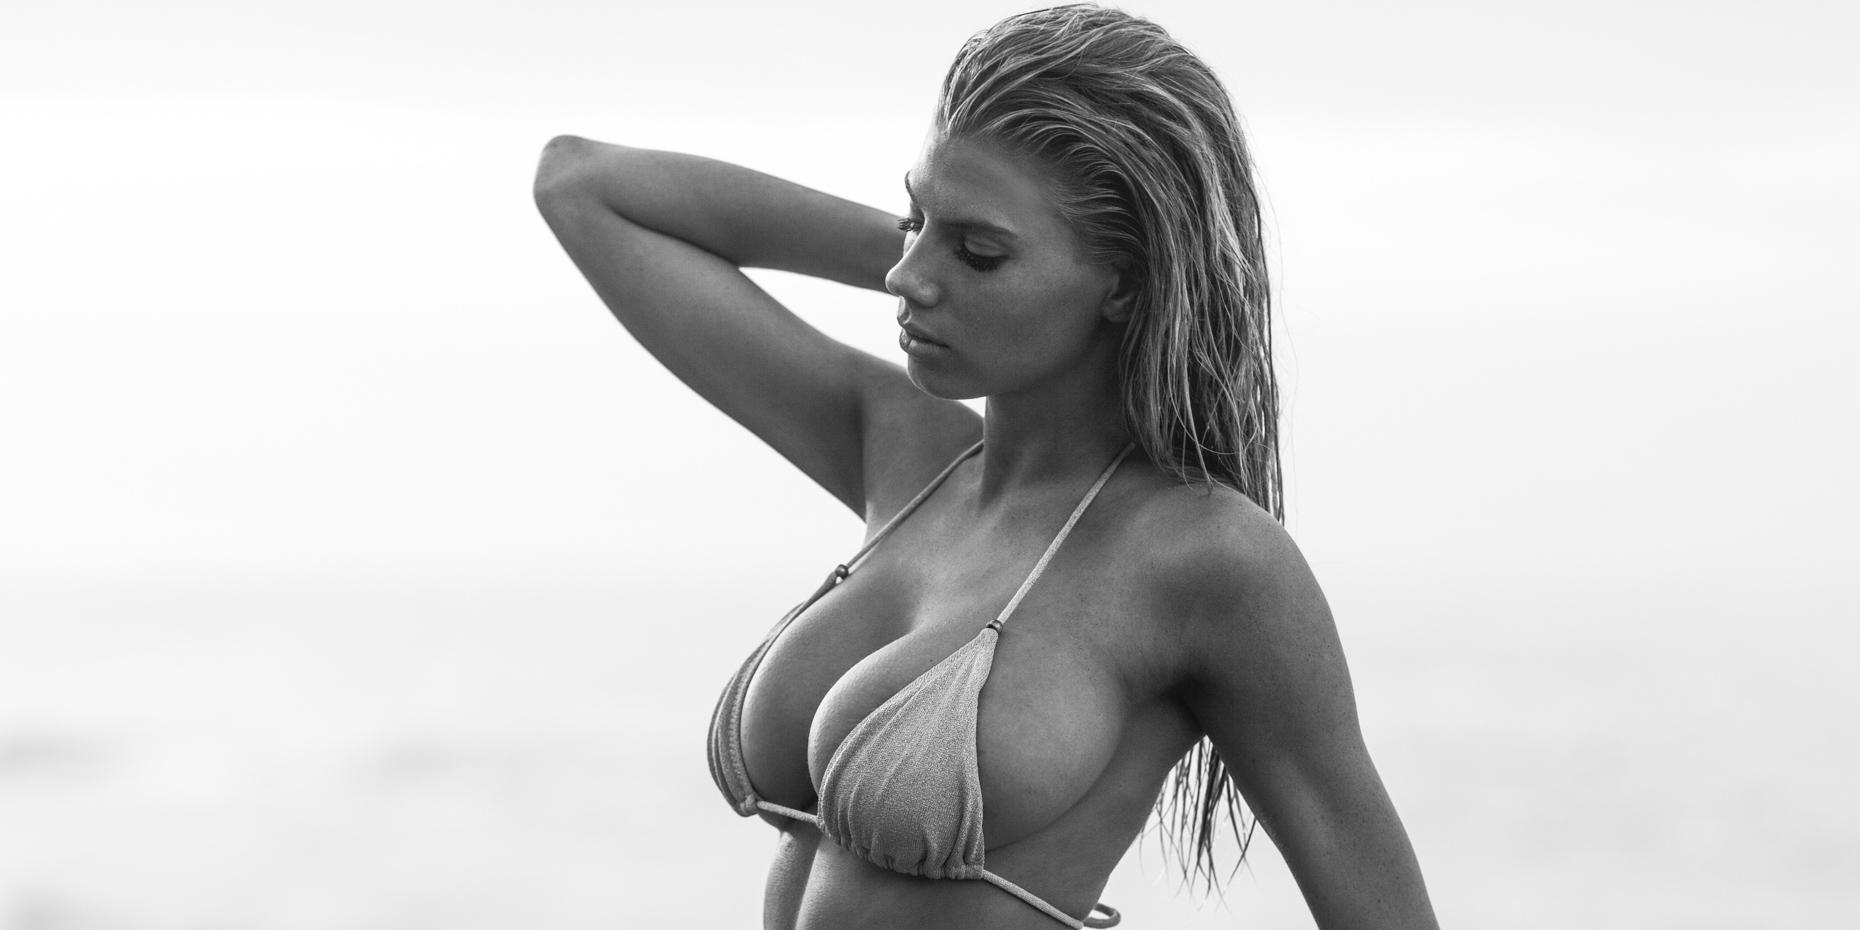 charlotte mckinney nude photoshoot